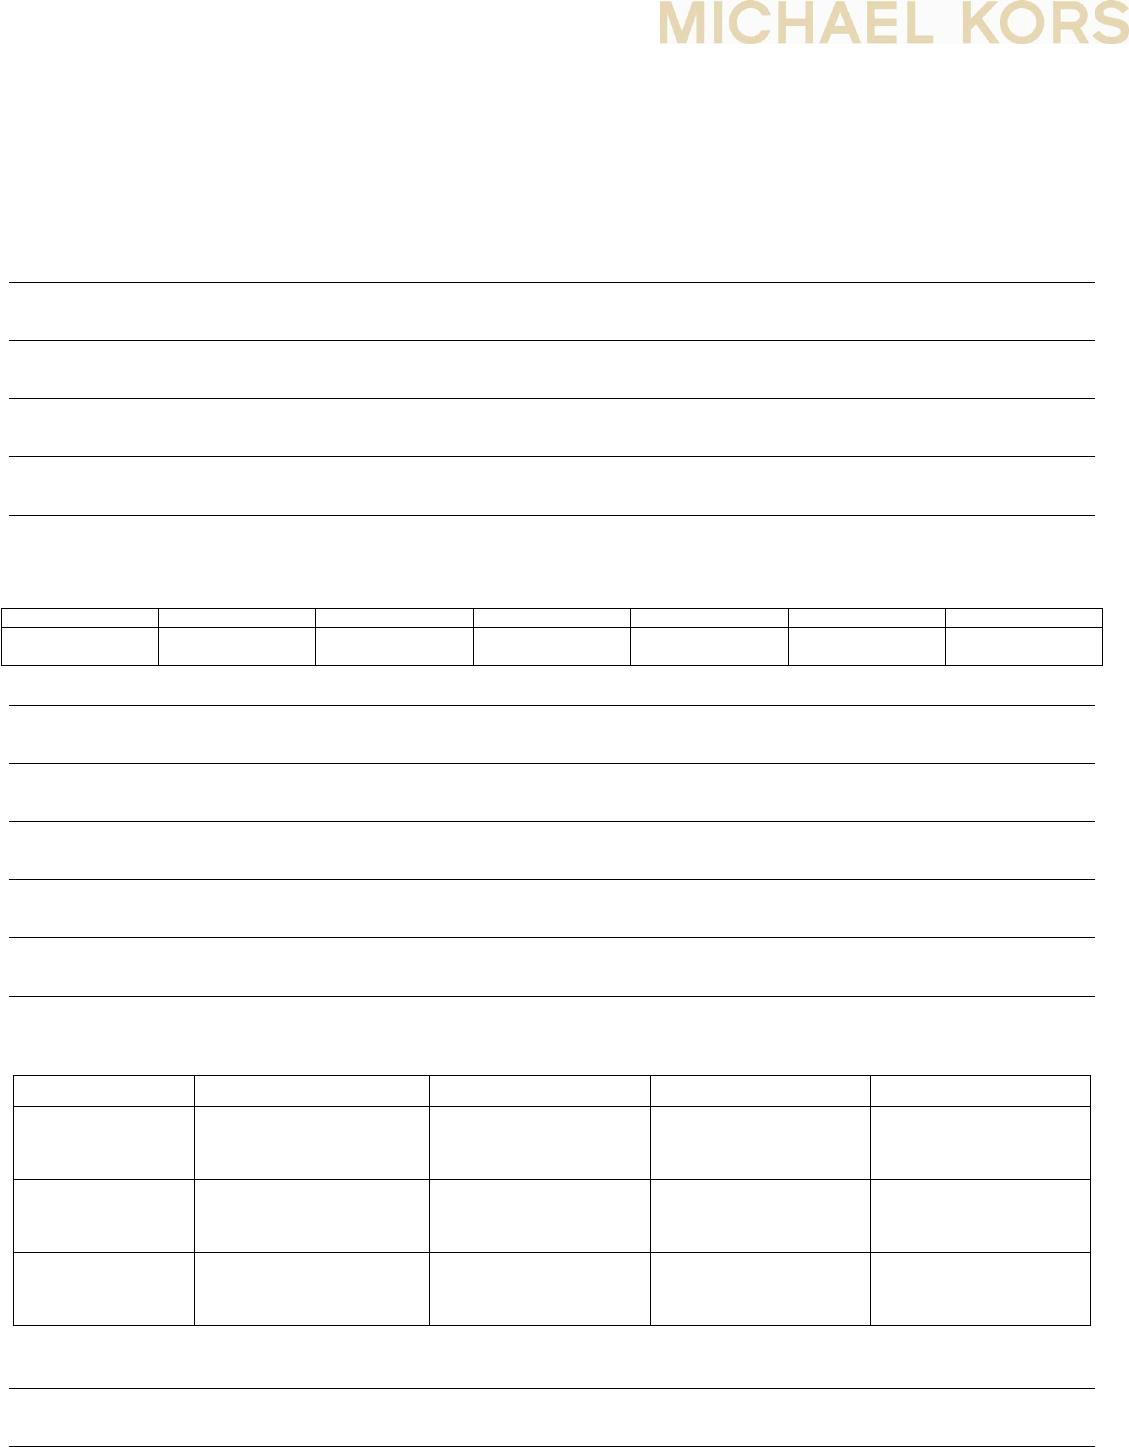 Free printable michael kors job application form falaconquin